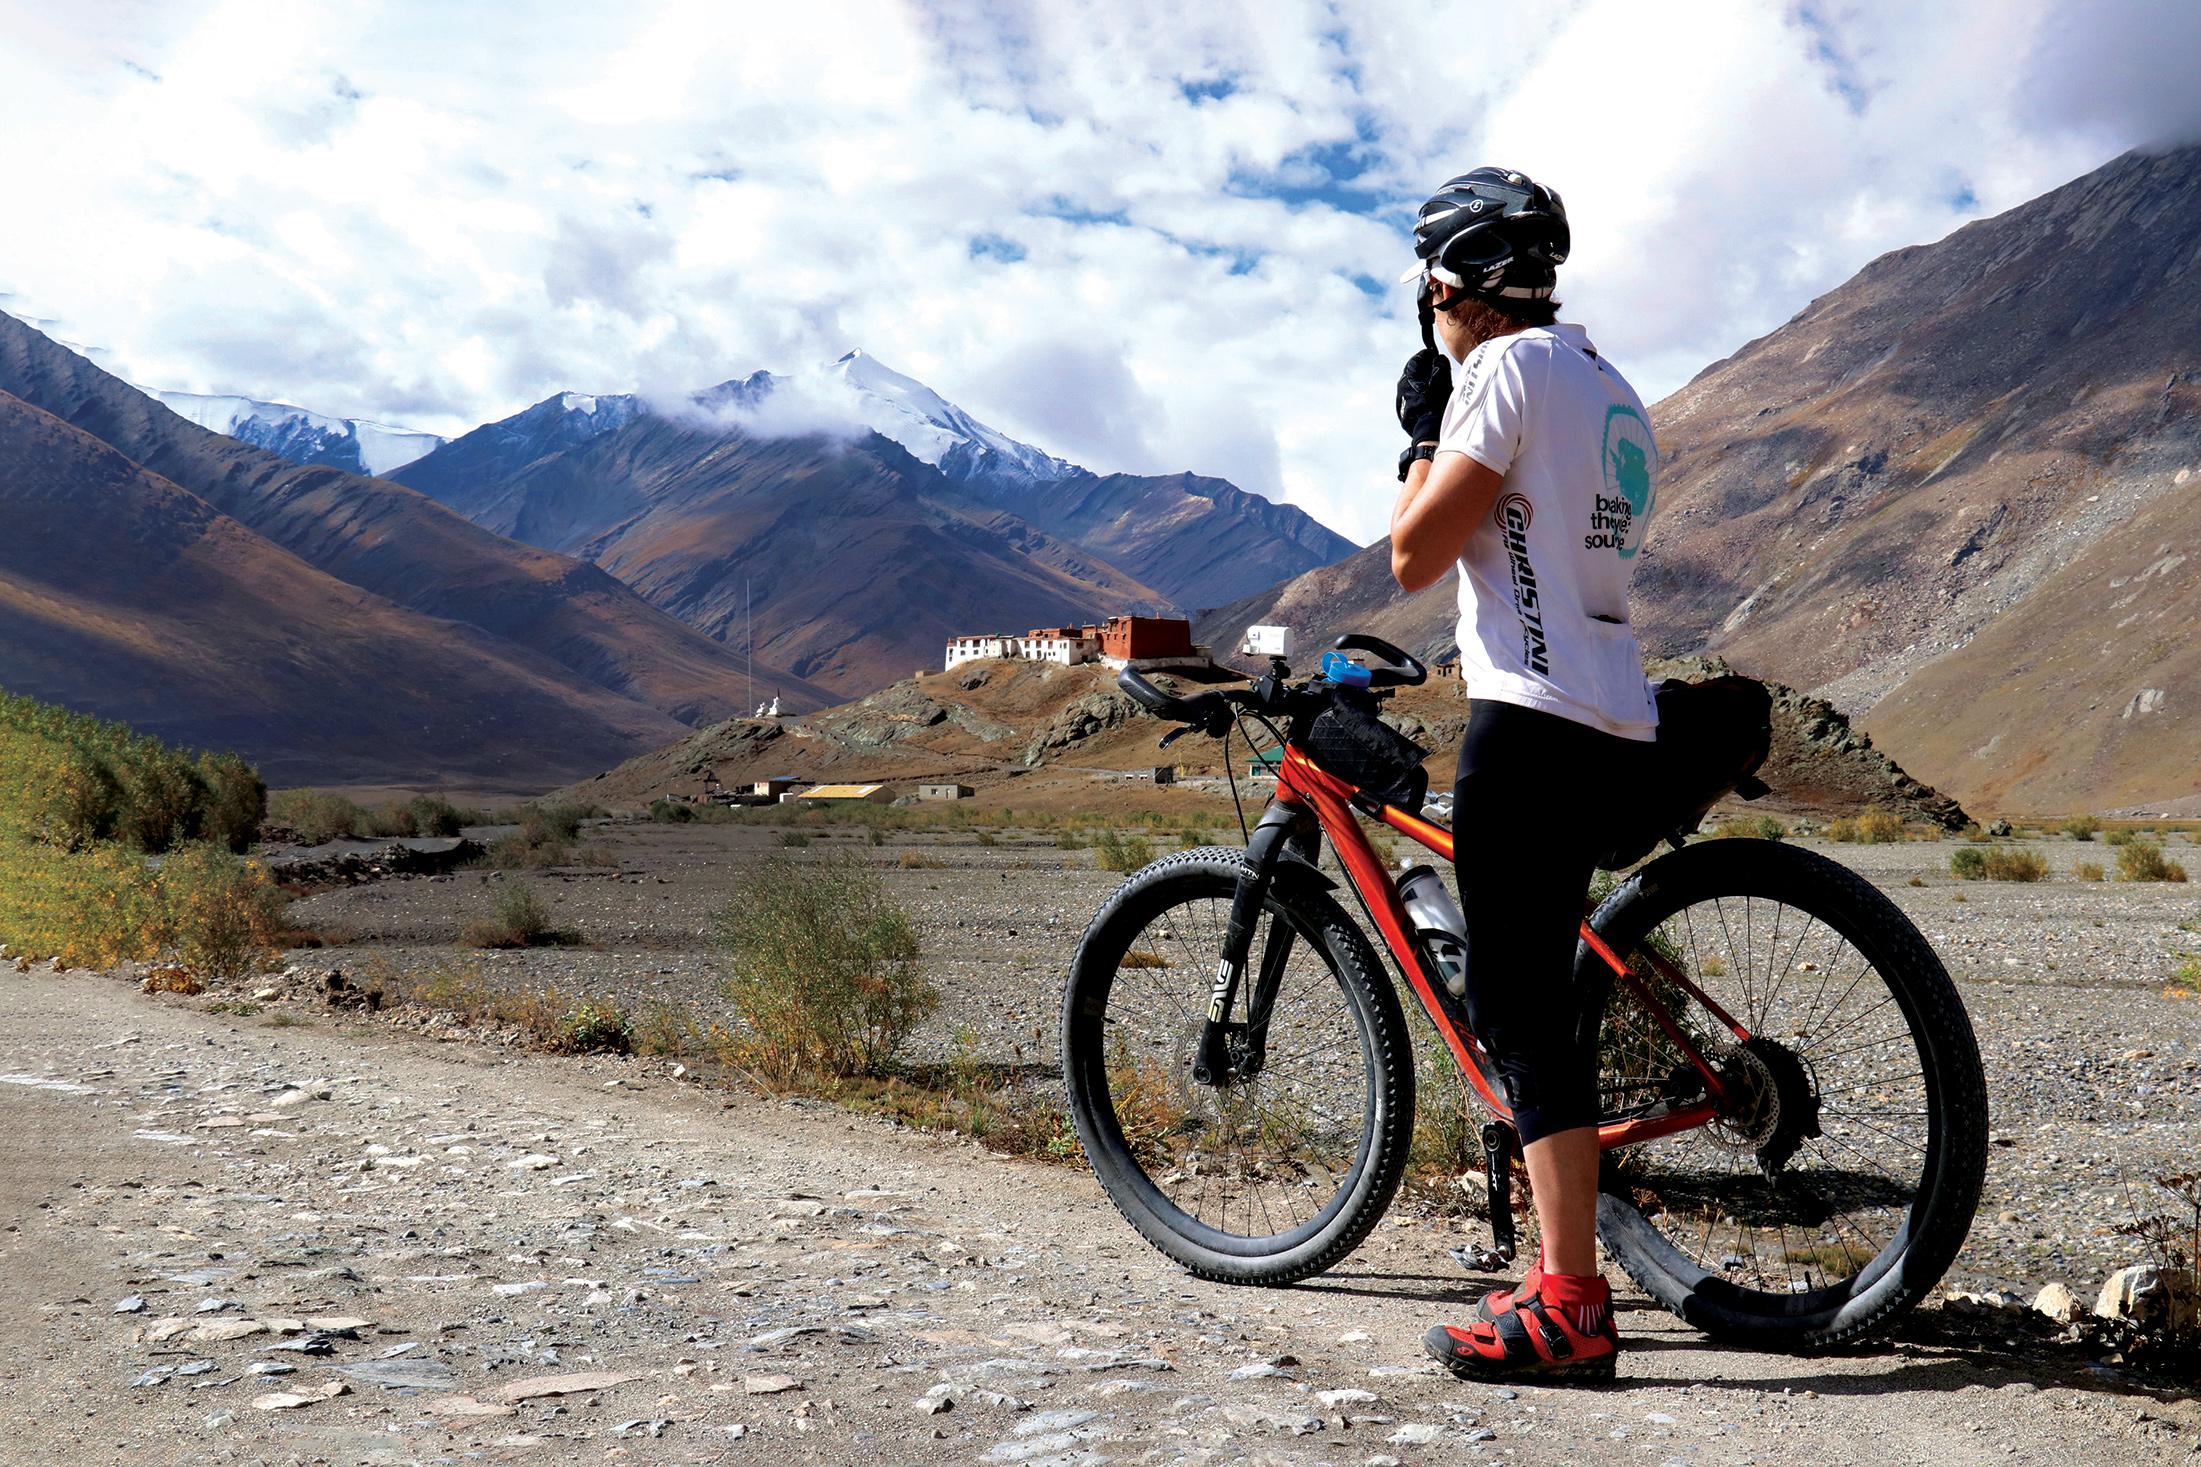 Kate Leeming catching breath on the road to Rangdum monastery. PICTURE CREDIT: Jigmet/Pixel Challenger